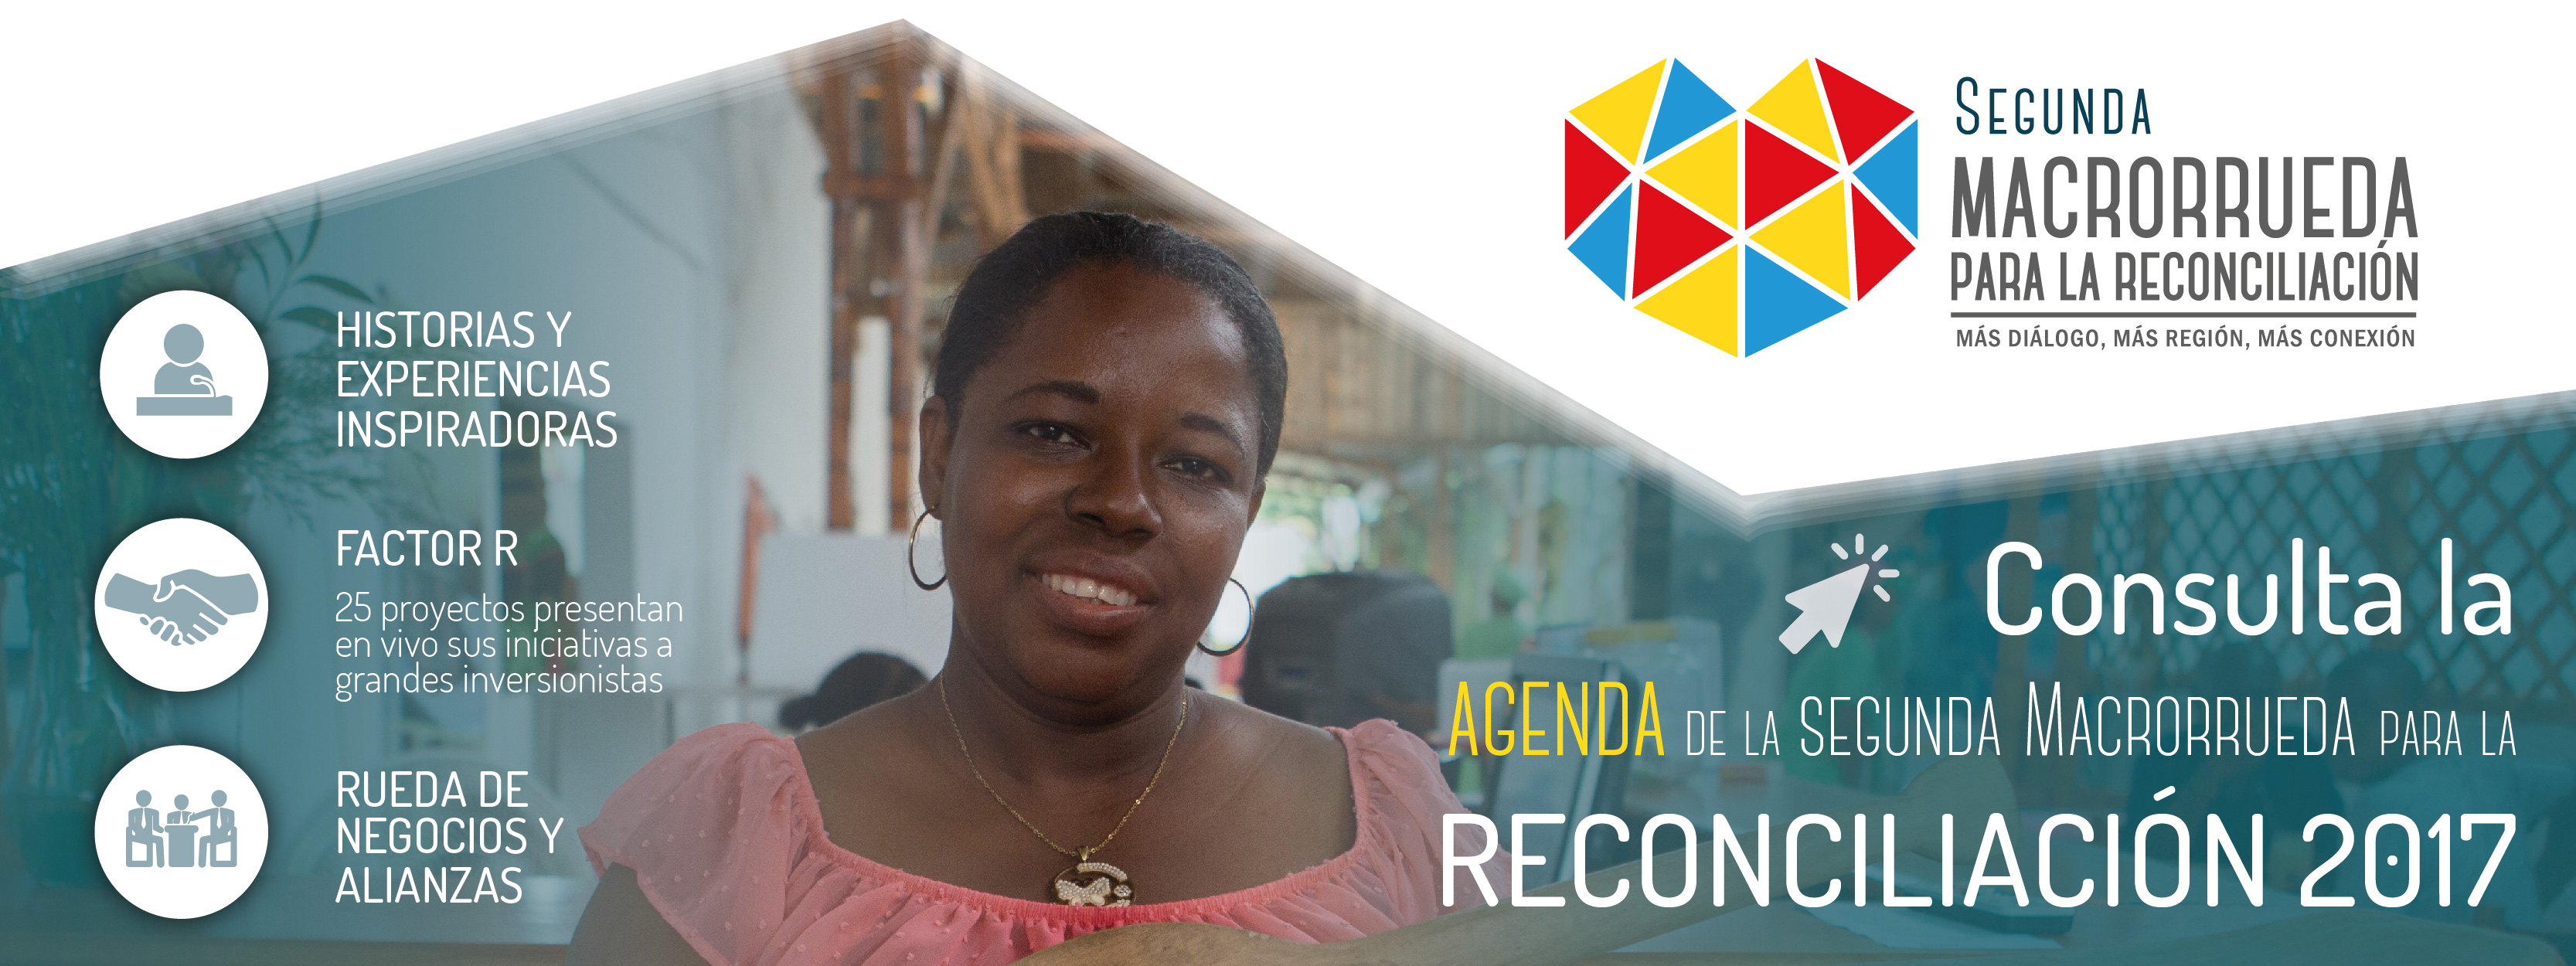 http://s3.amazonaws.com/macrorrueda2017/banner/1508538761.Banner_Tama%C3%B1o_ajustado.jpg